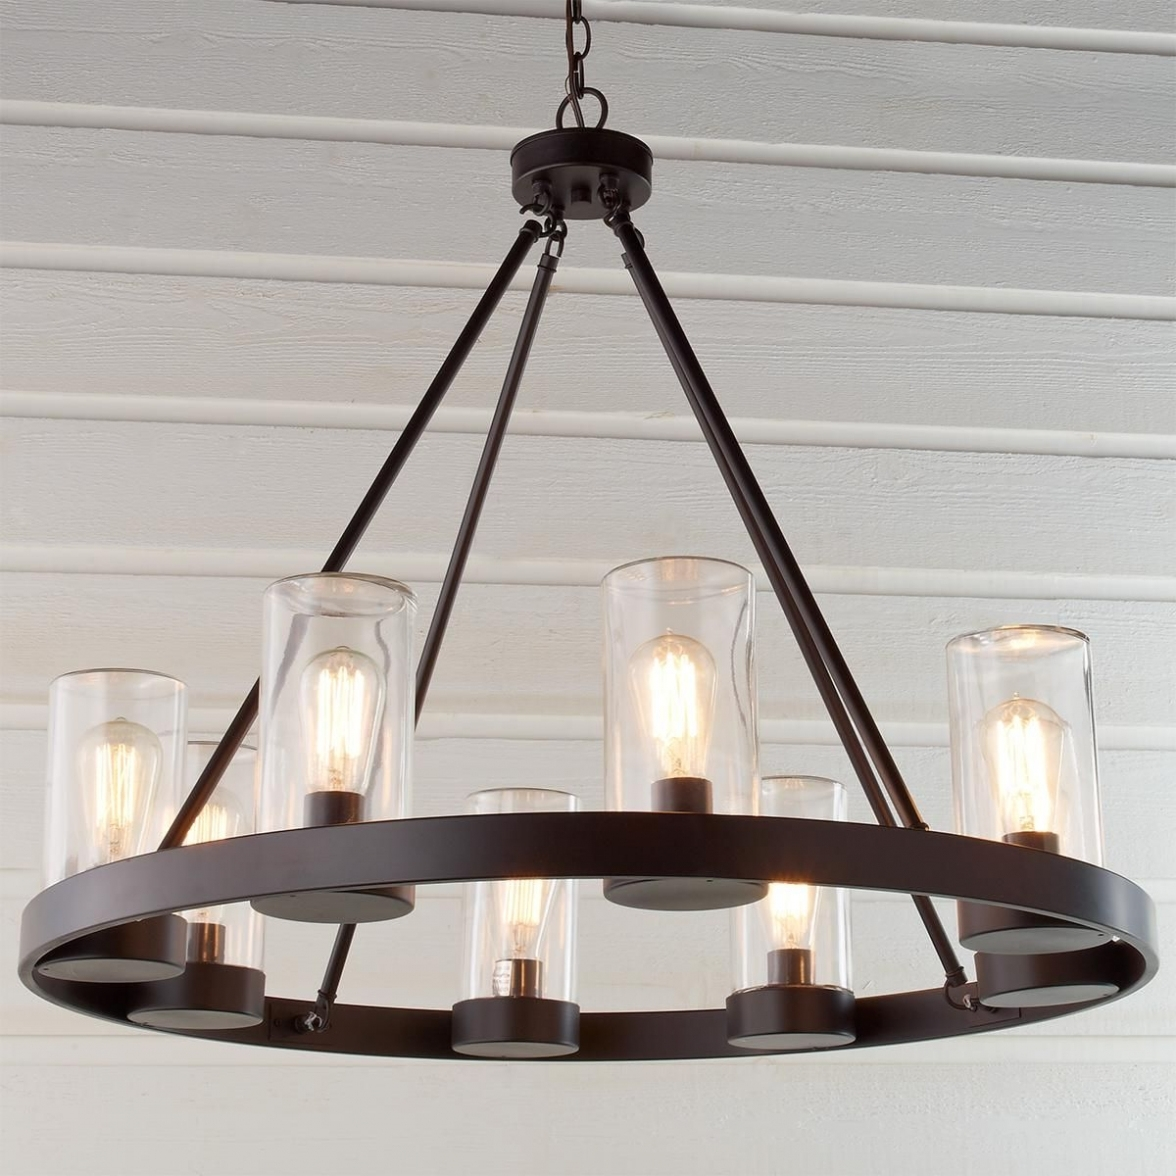 Newest Lighting: Kichler Lighting Barrington 5 Light Distressed Black And For Outdoor Chandelier Kichler Lighting (View 10 of 20)